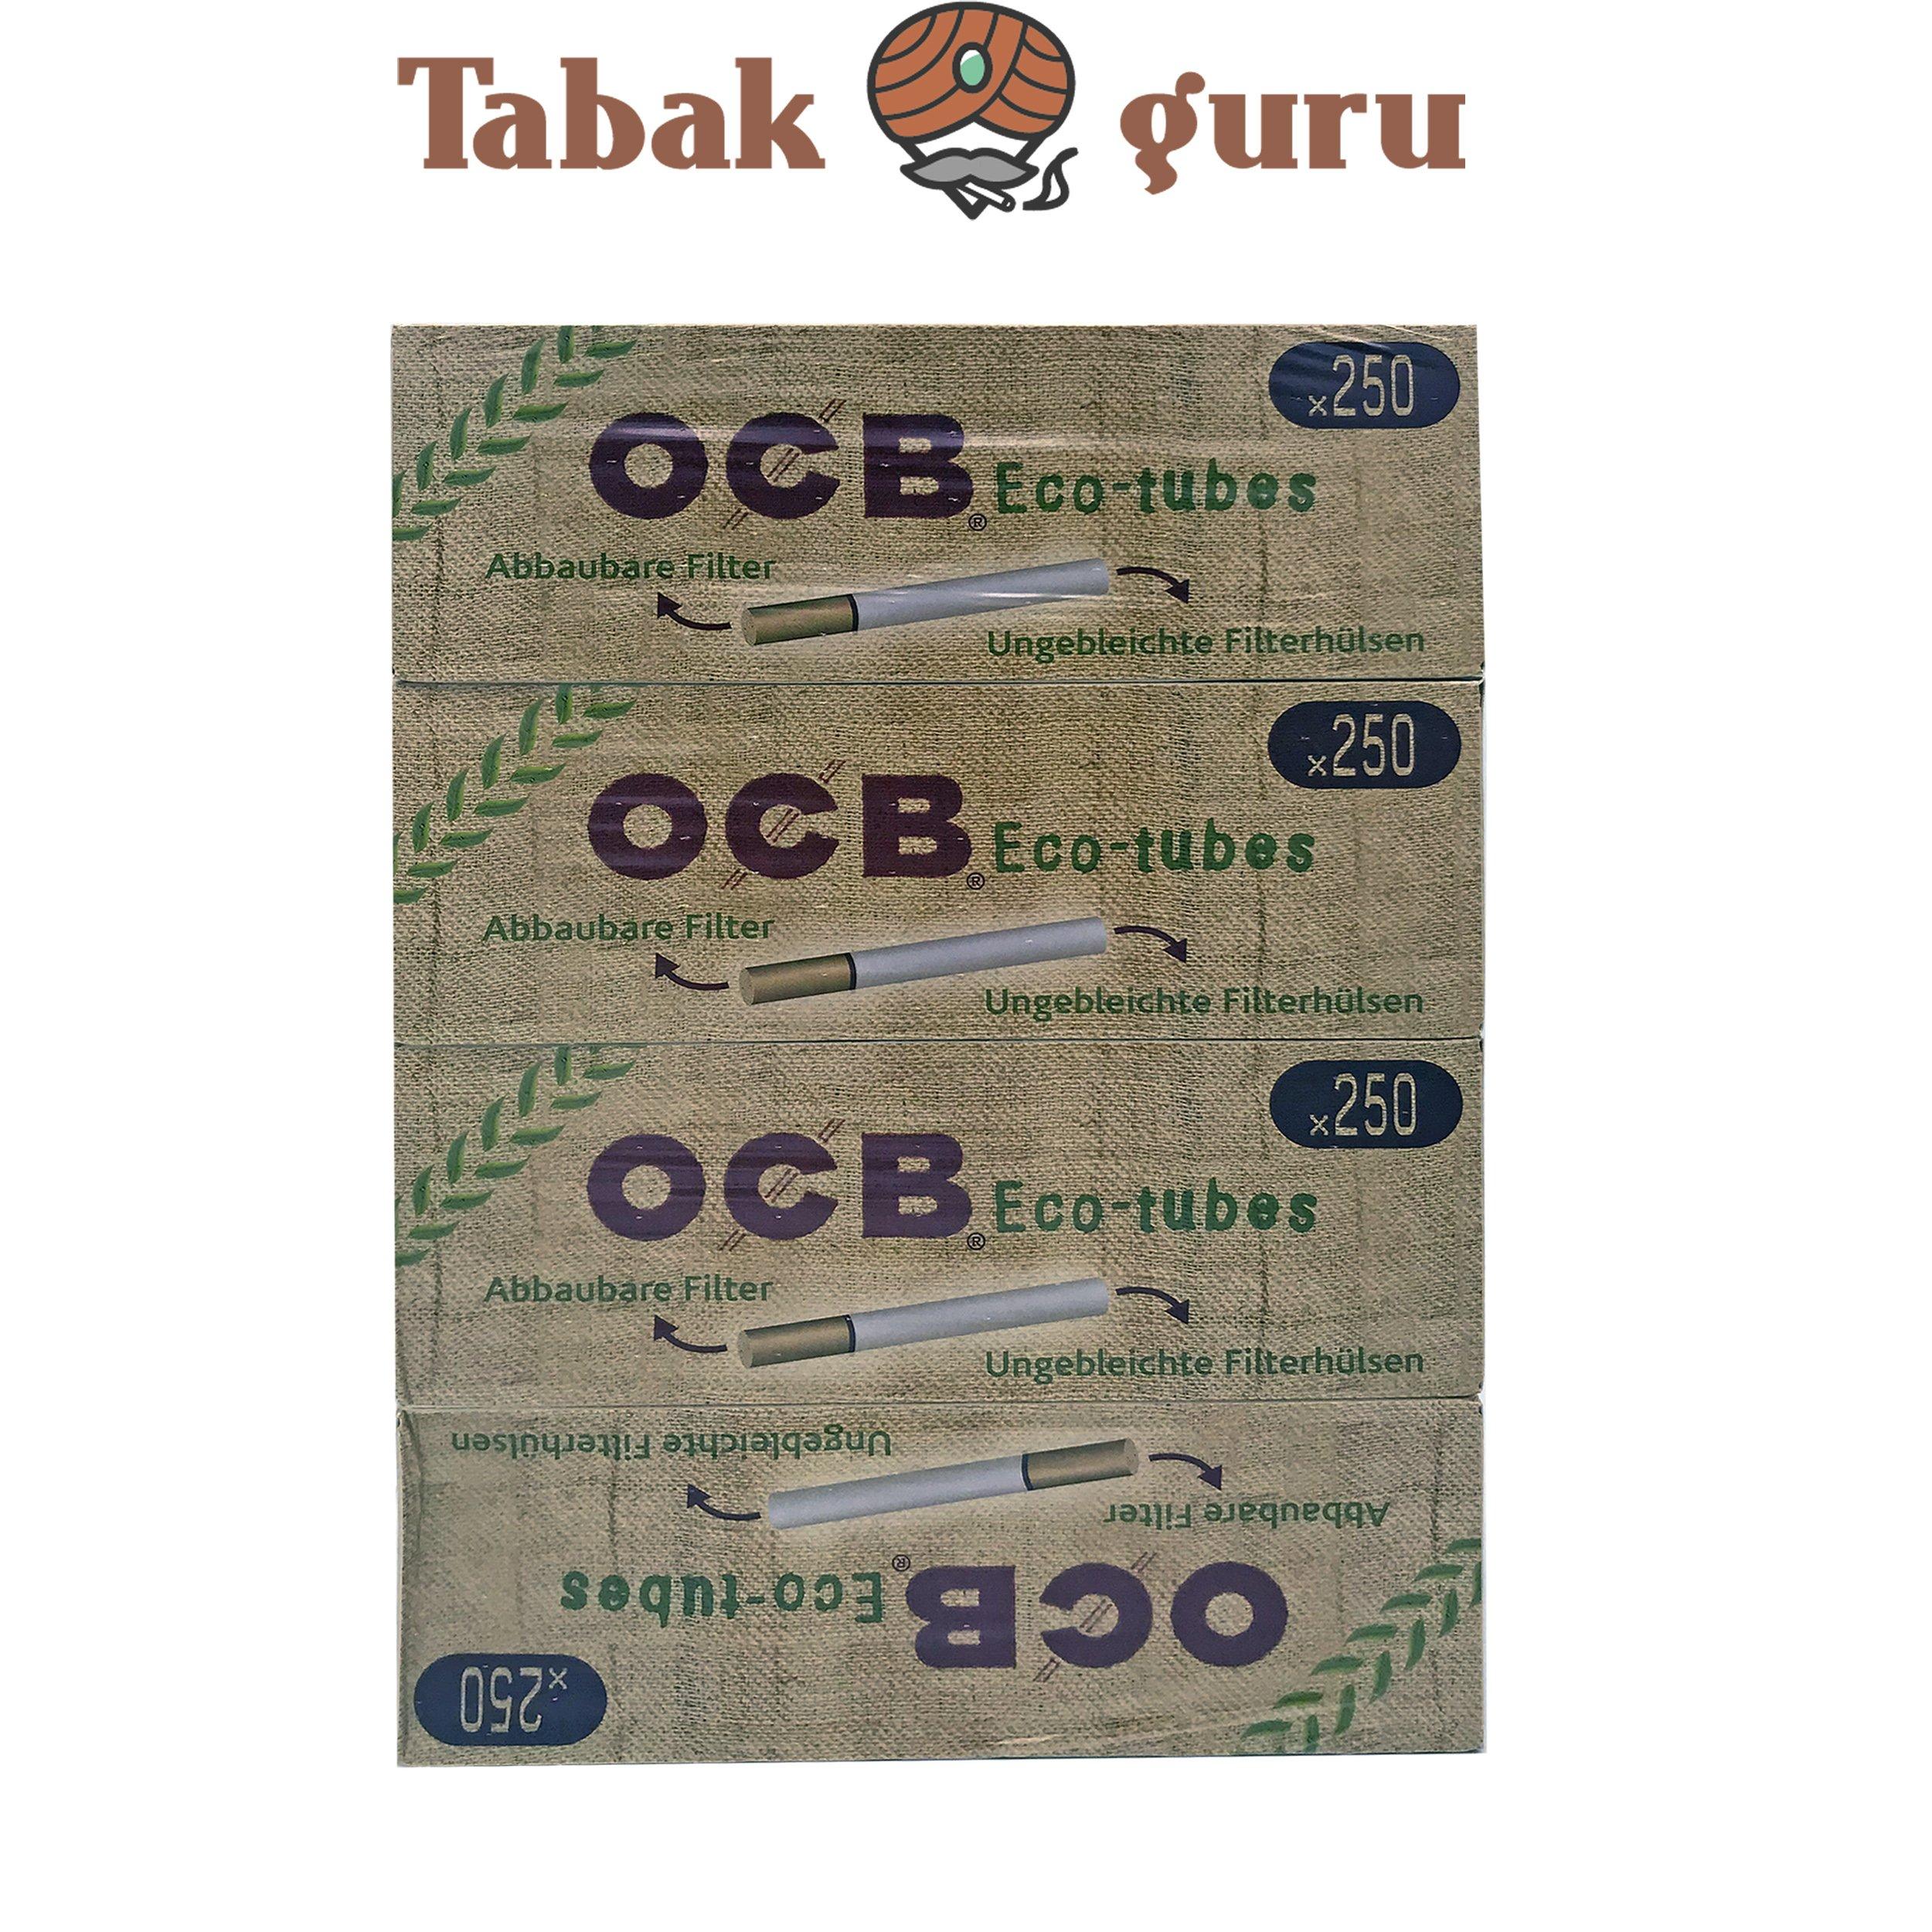 1.000 OCB Eco-Tube Filterhülsen = 4 Pack à 250 Stück